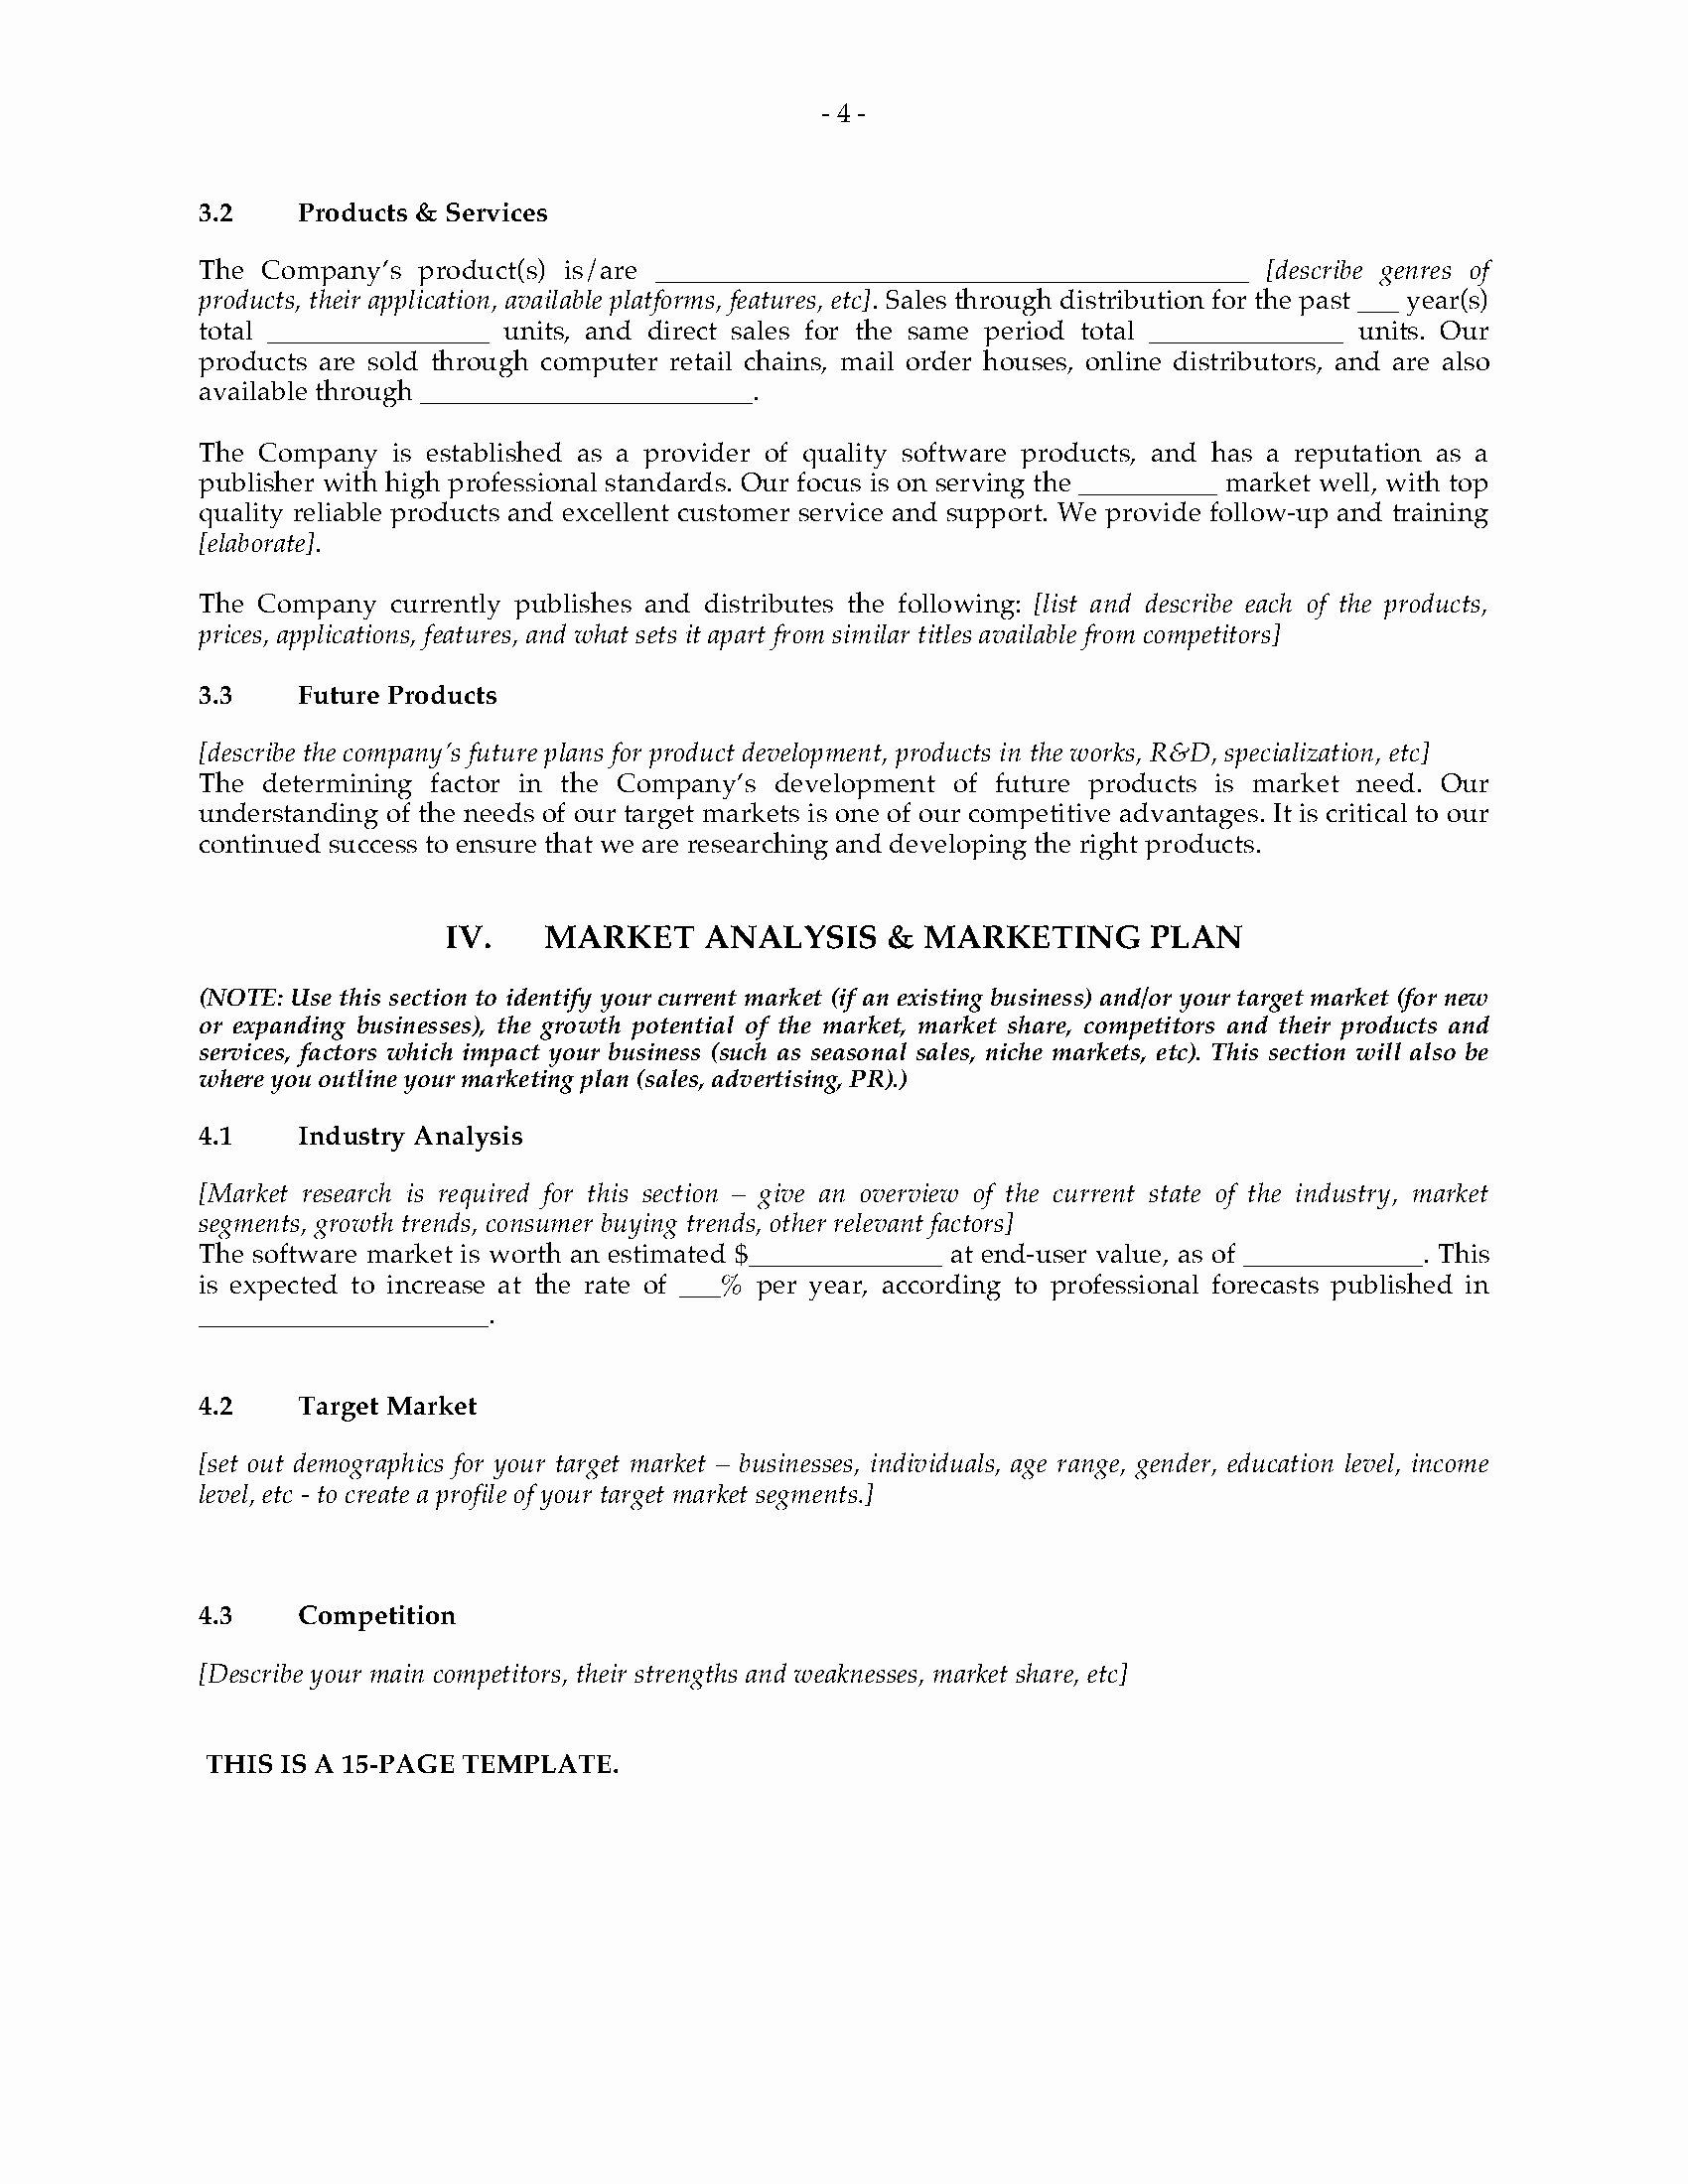 Expansion Plan Template Unique software Publisher Business Plan for Expansion